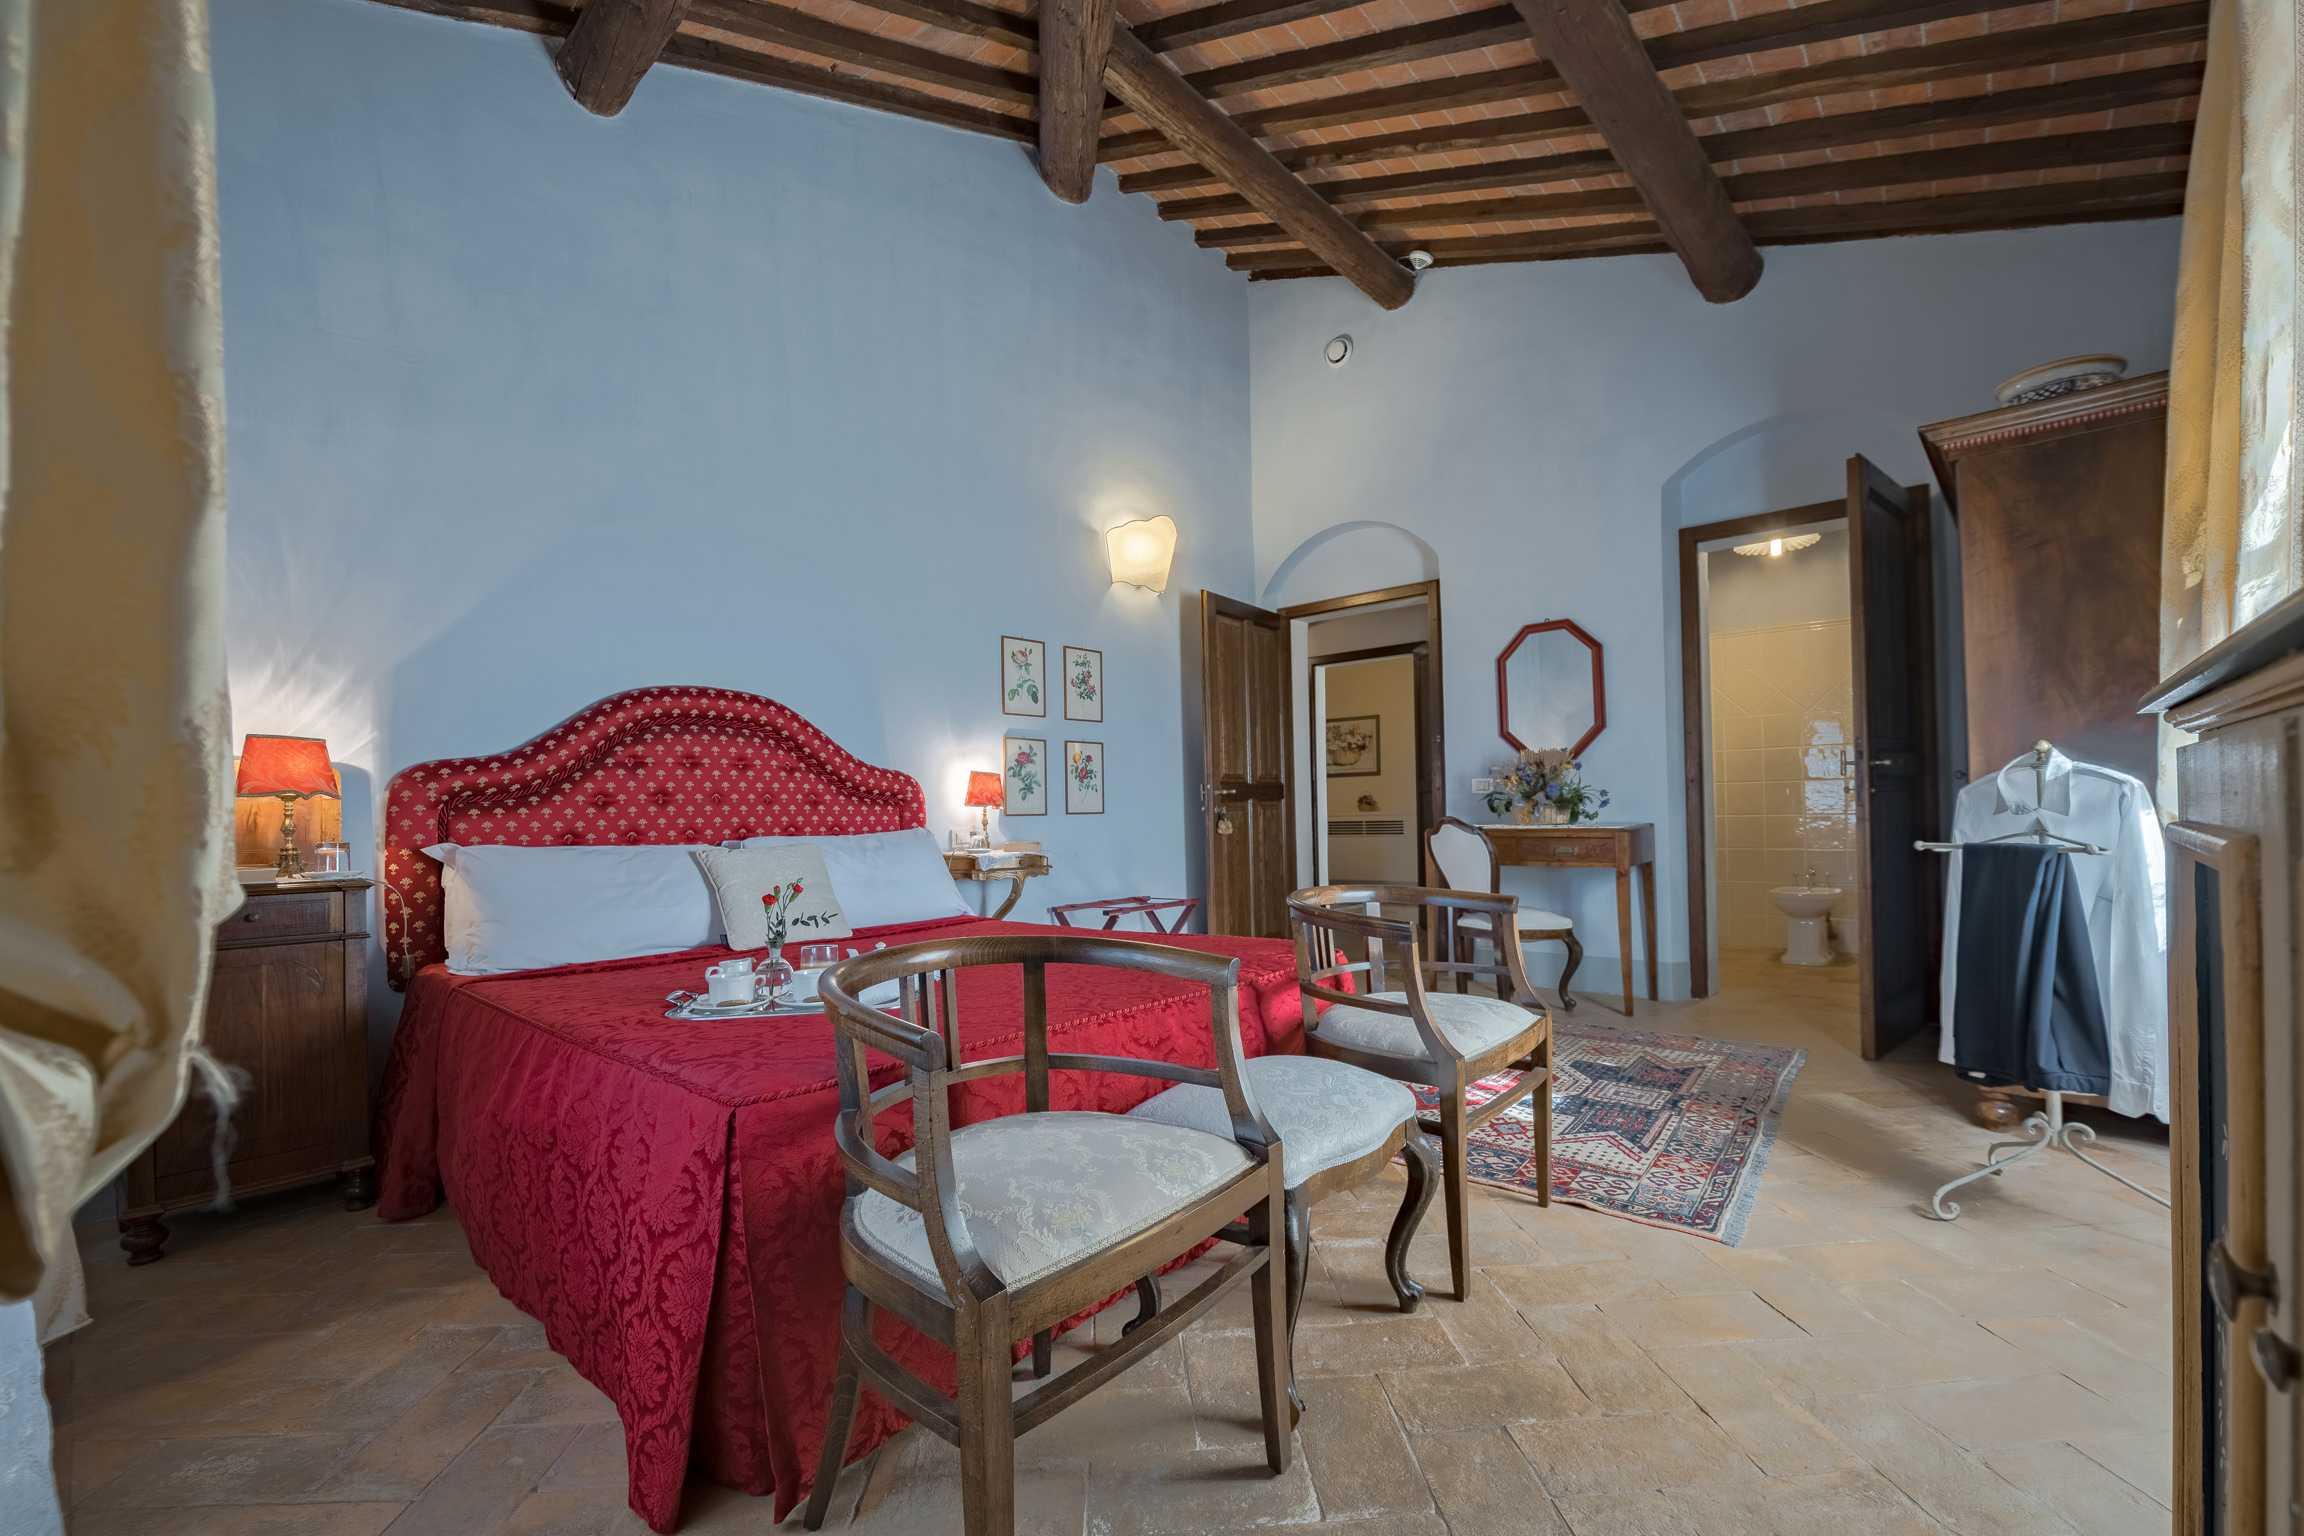 Villa de' Michelangioli slaapkamer